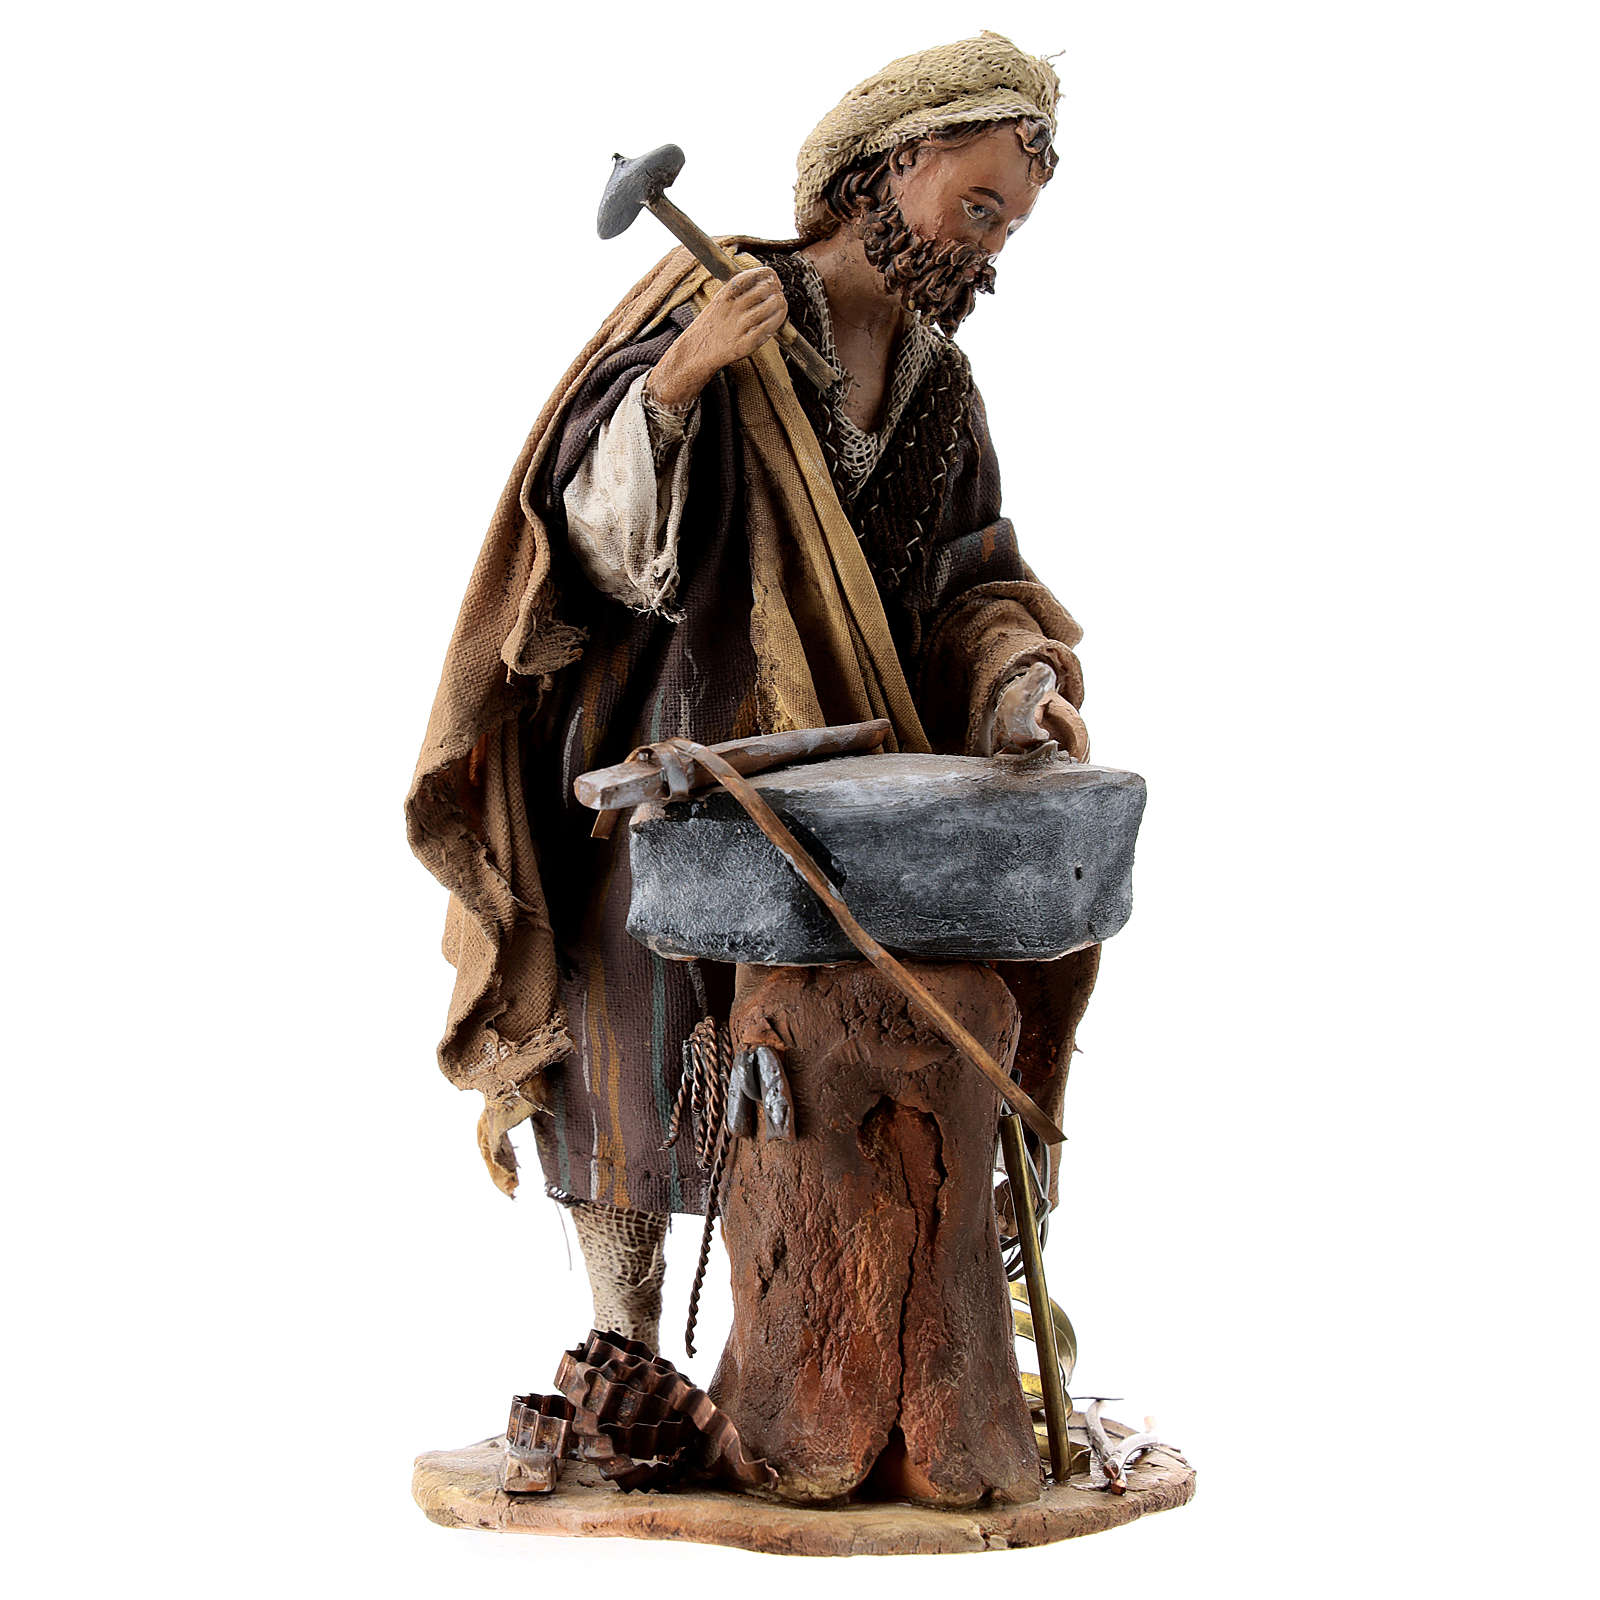 Nativity scene figurine, Blacksmith at work by Angela Tripi 13 cm 4